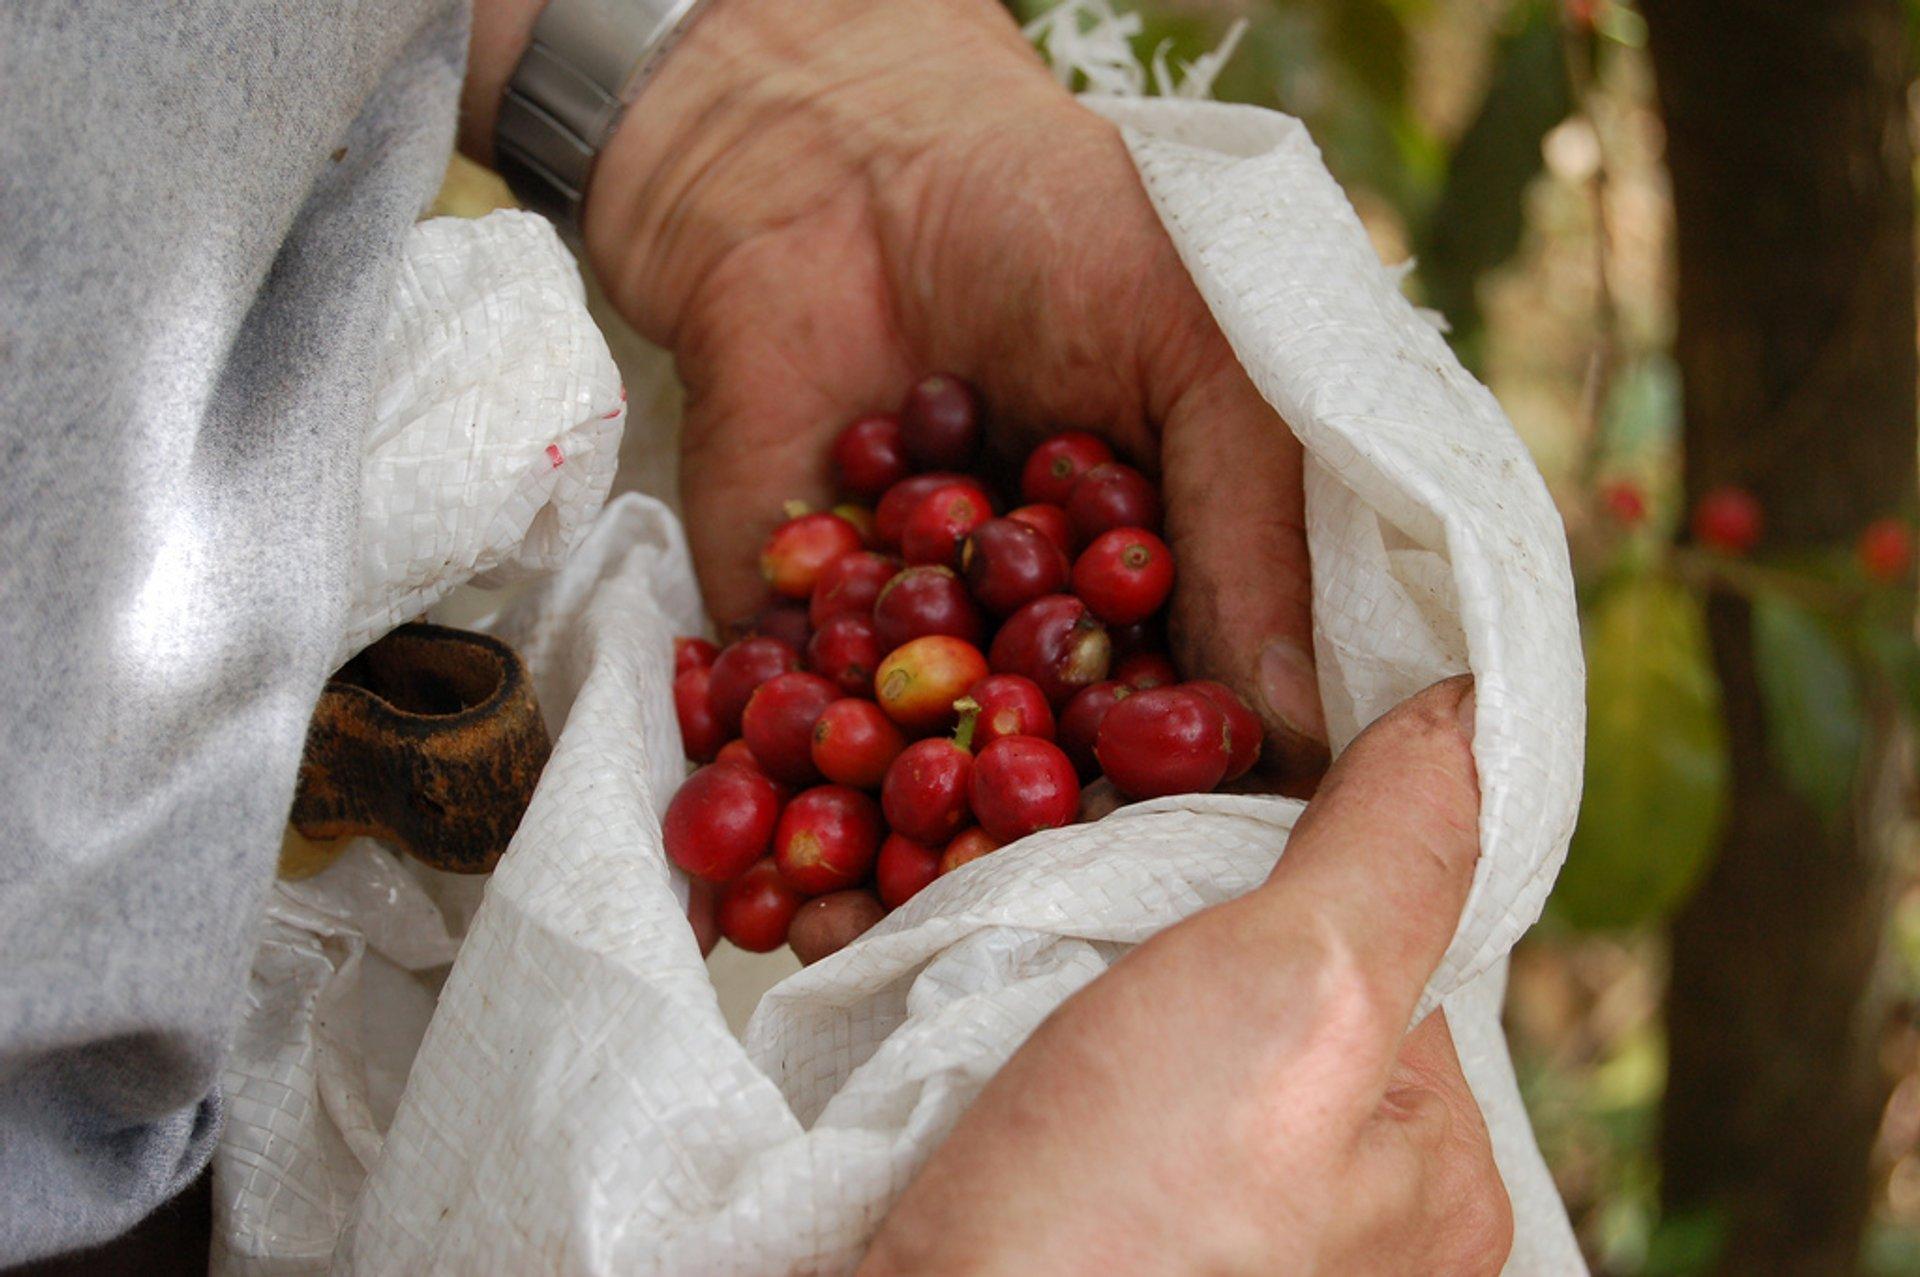 Inspecting coffee cherries 2020